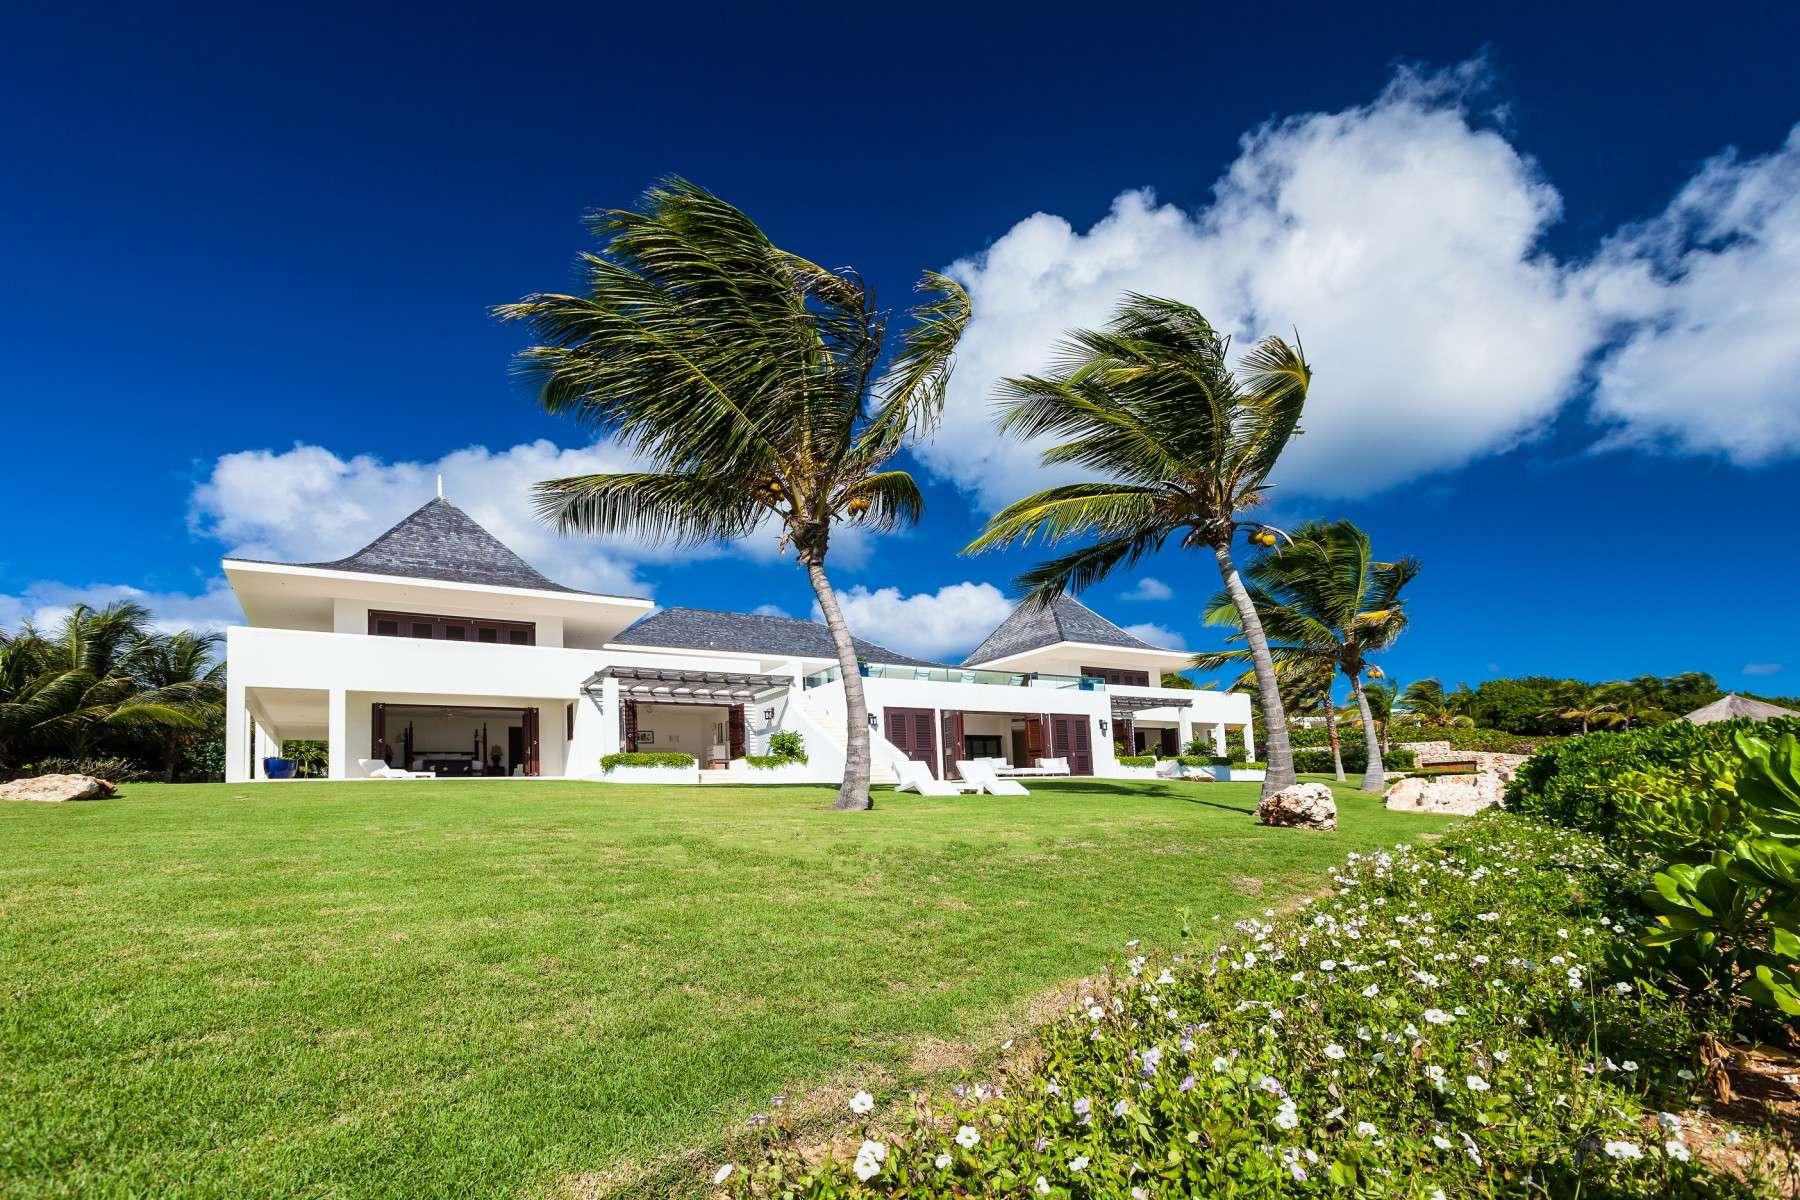 Luxury villa rentals caribbean - Anguilla - Little harbour anguilla - No location 4 - Le Bleu Villa - Image 1/14